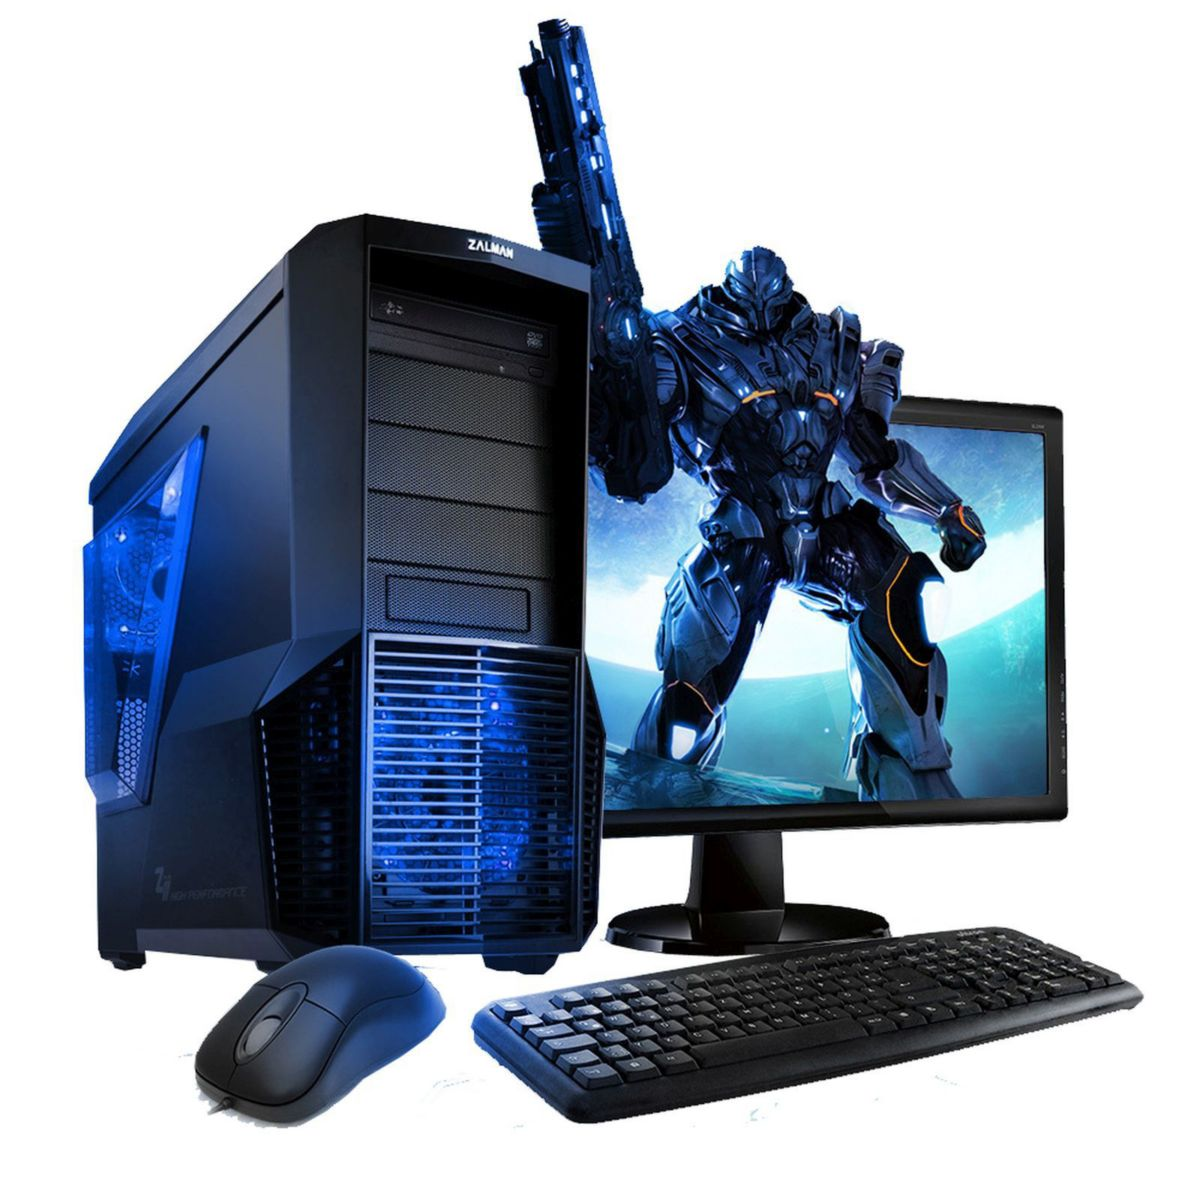 Aktuelle Angebote Kaufroboter Die Discounter Suchmaschine Lenovo Ideacentre Aio510 22ish Core I3 7100t 4gb Ddr4 1tb Hd Black Vcm Gaming Pc Set Intel 7100 2x 39 Ghz Windows 10 22 Tft